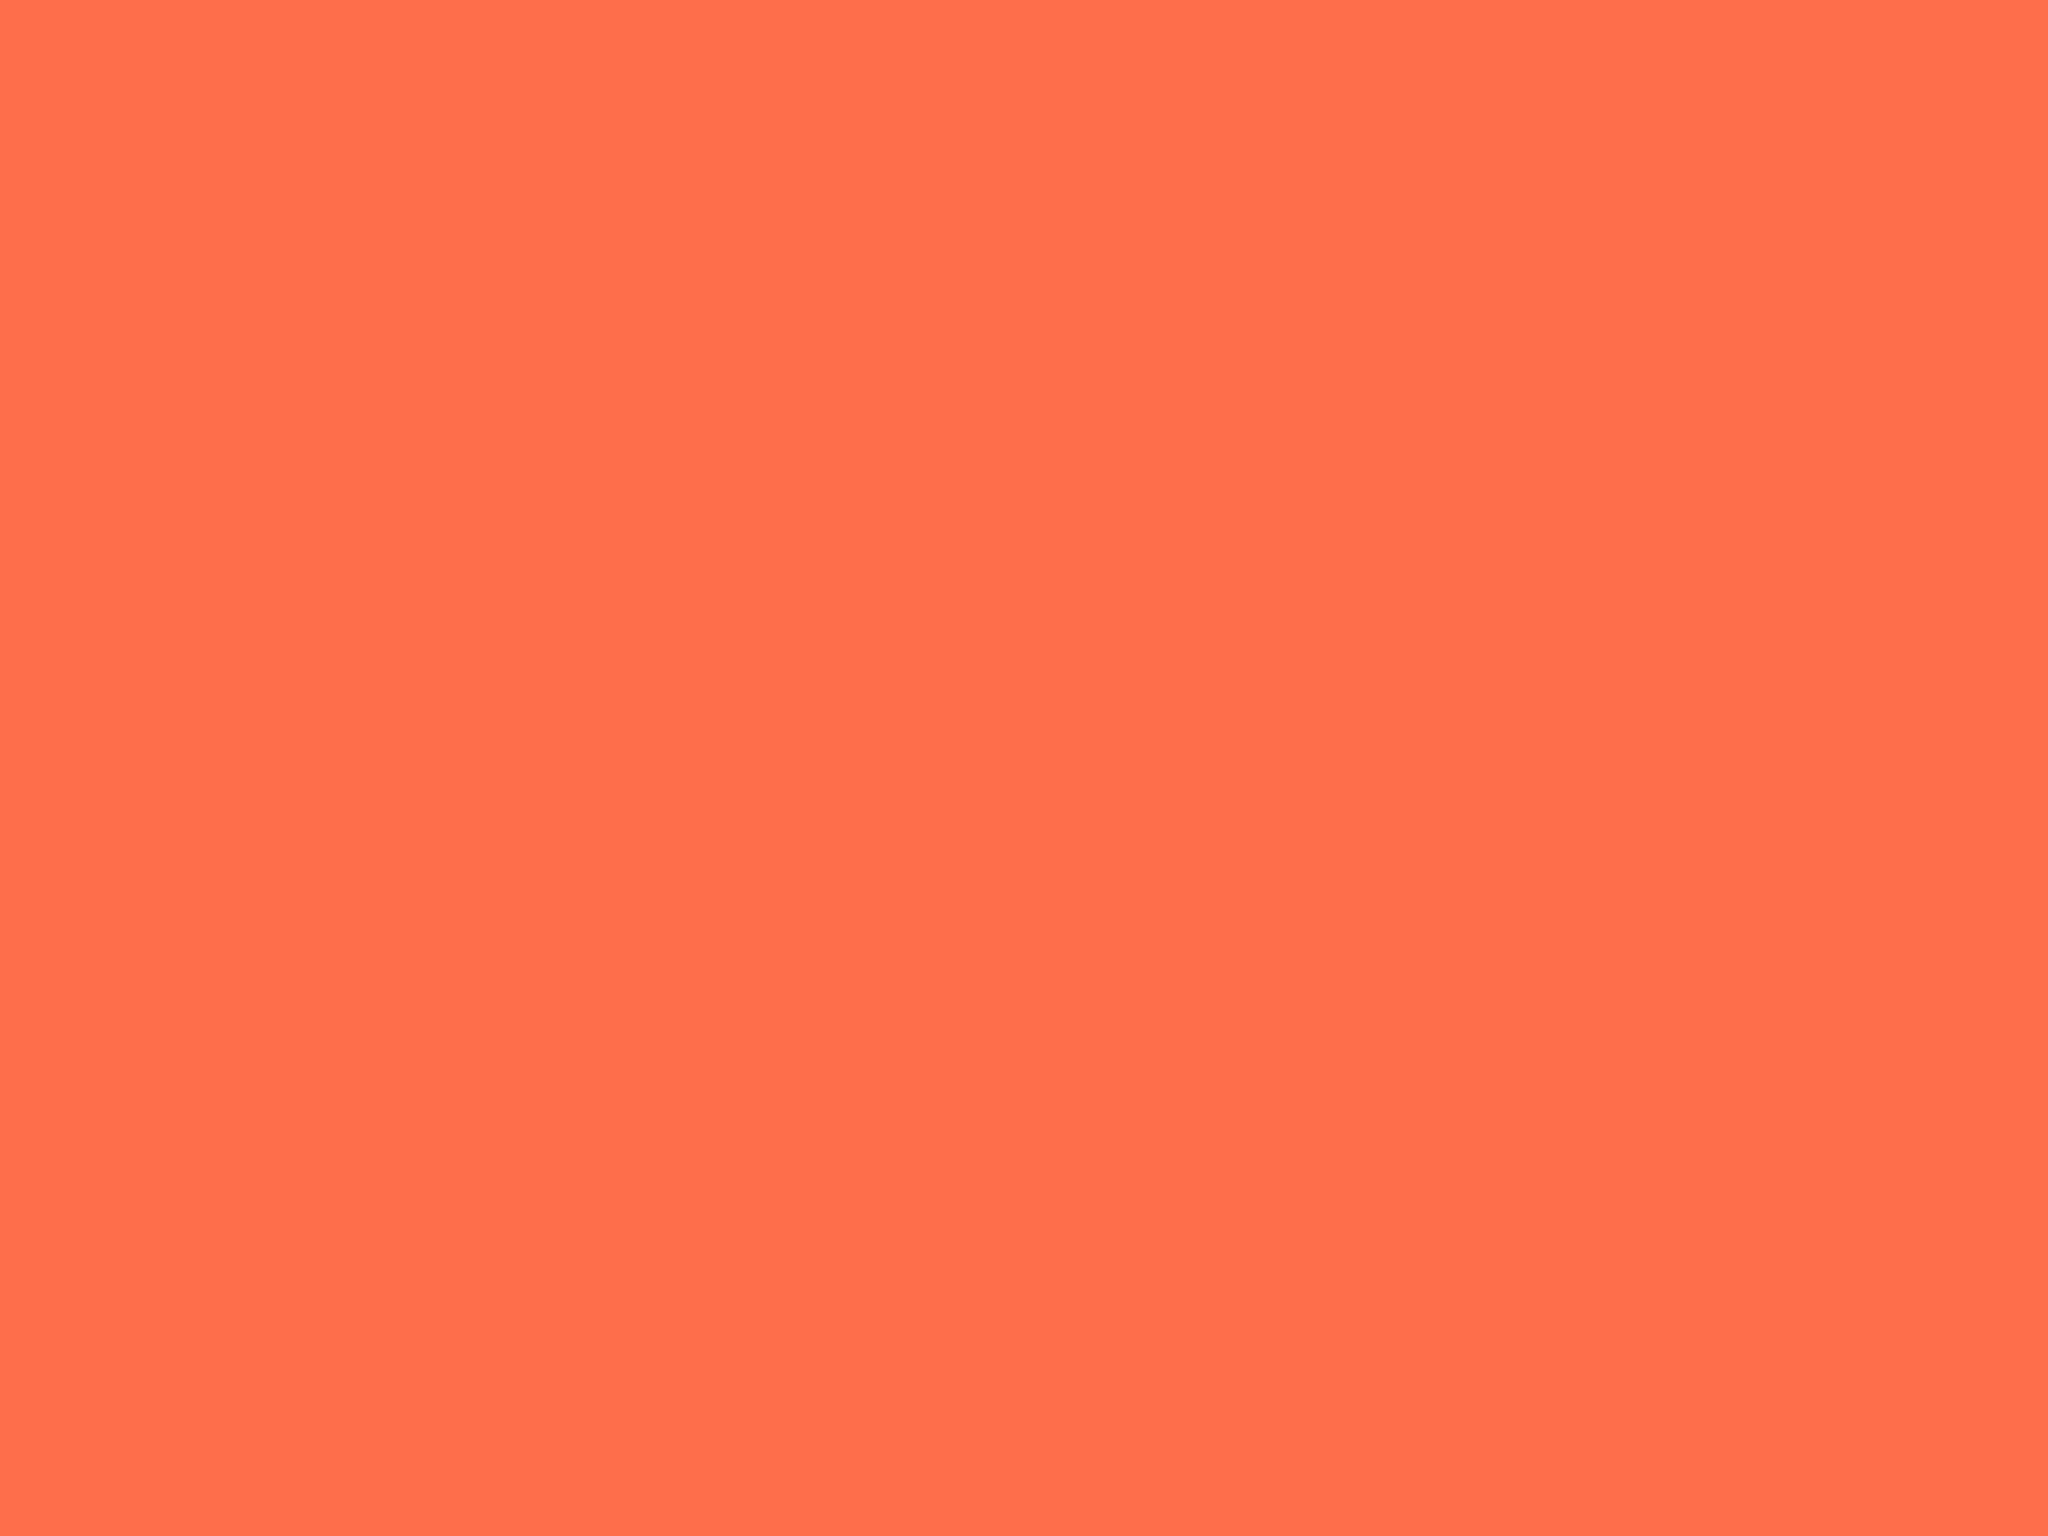 2048x1536 Outrageous Orange Solid Color Background